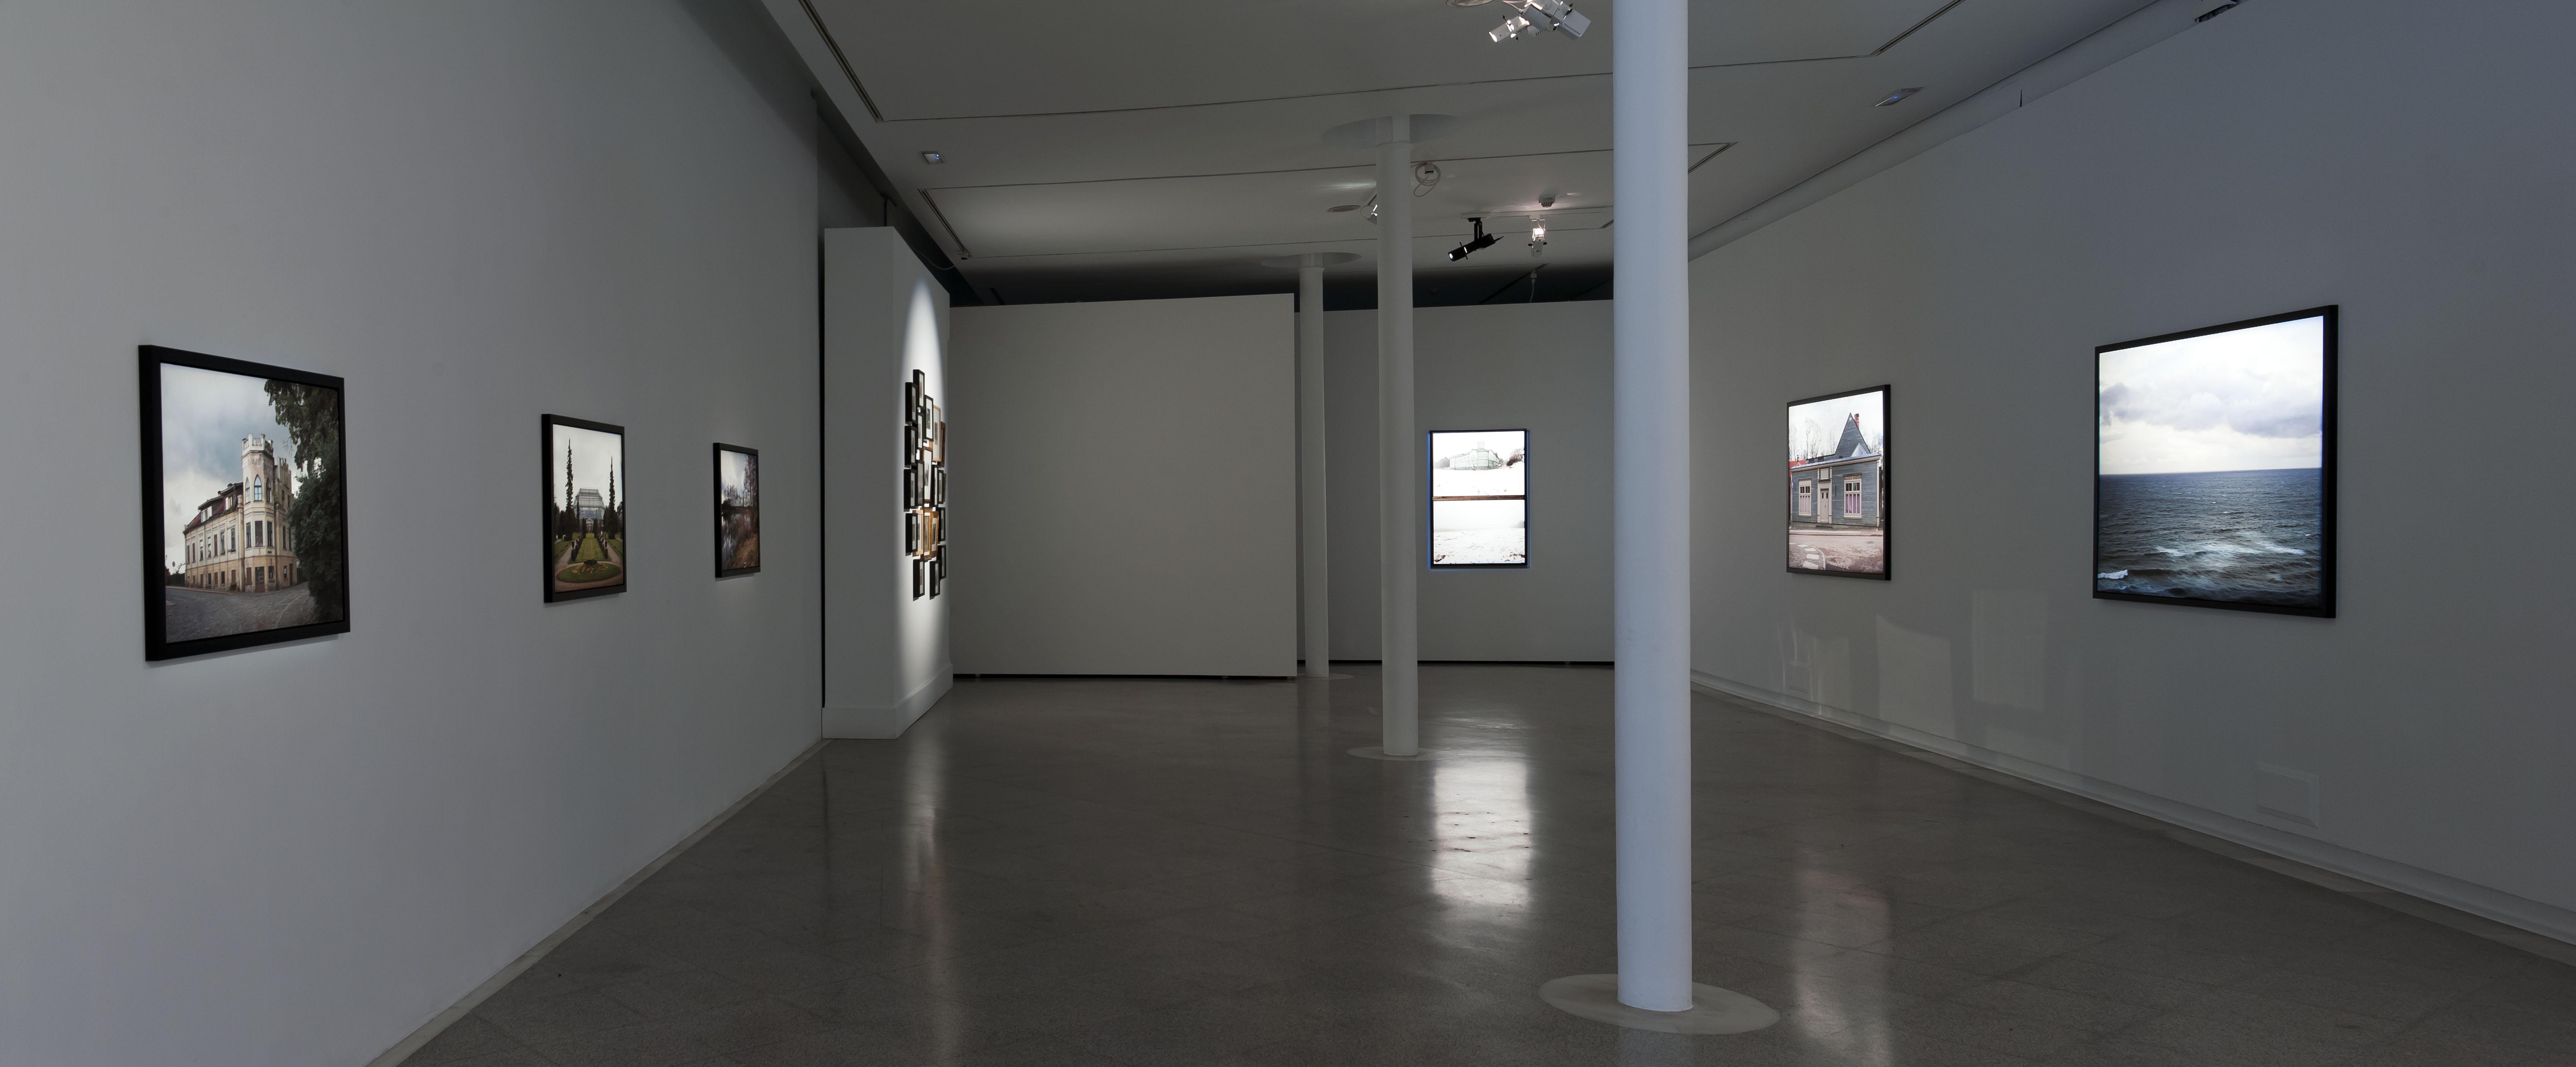 Panorama Instalación Nah u Fern_2012_1